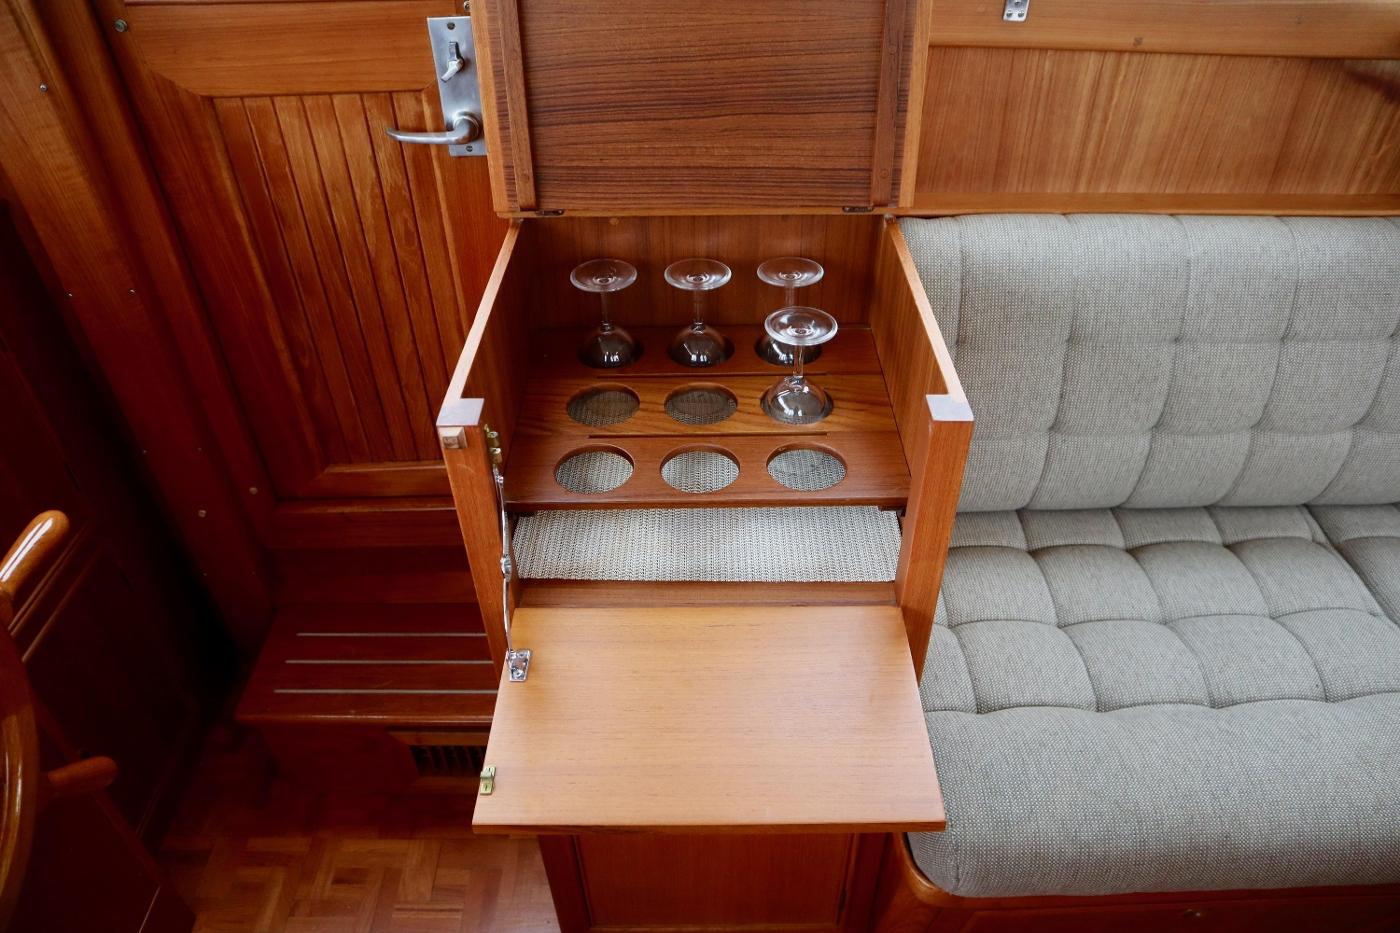 1995 Grand Banks 36 Classic, Bar Cabinet